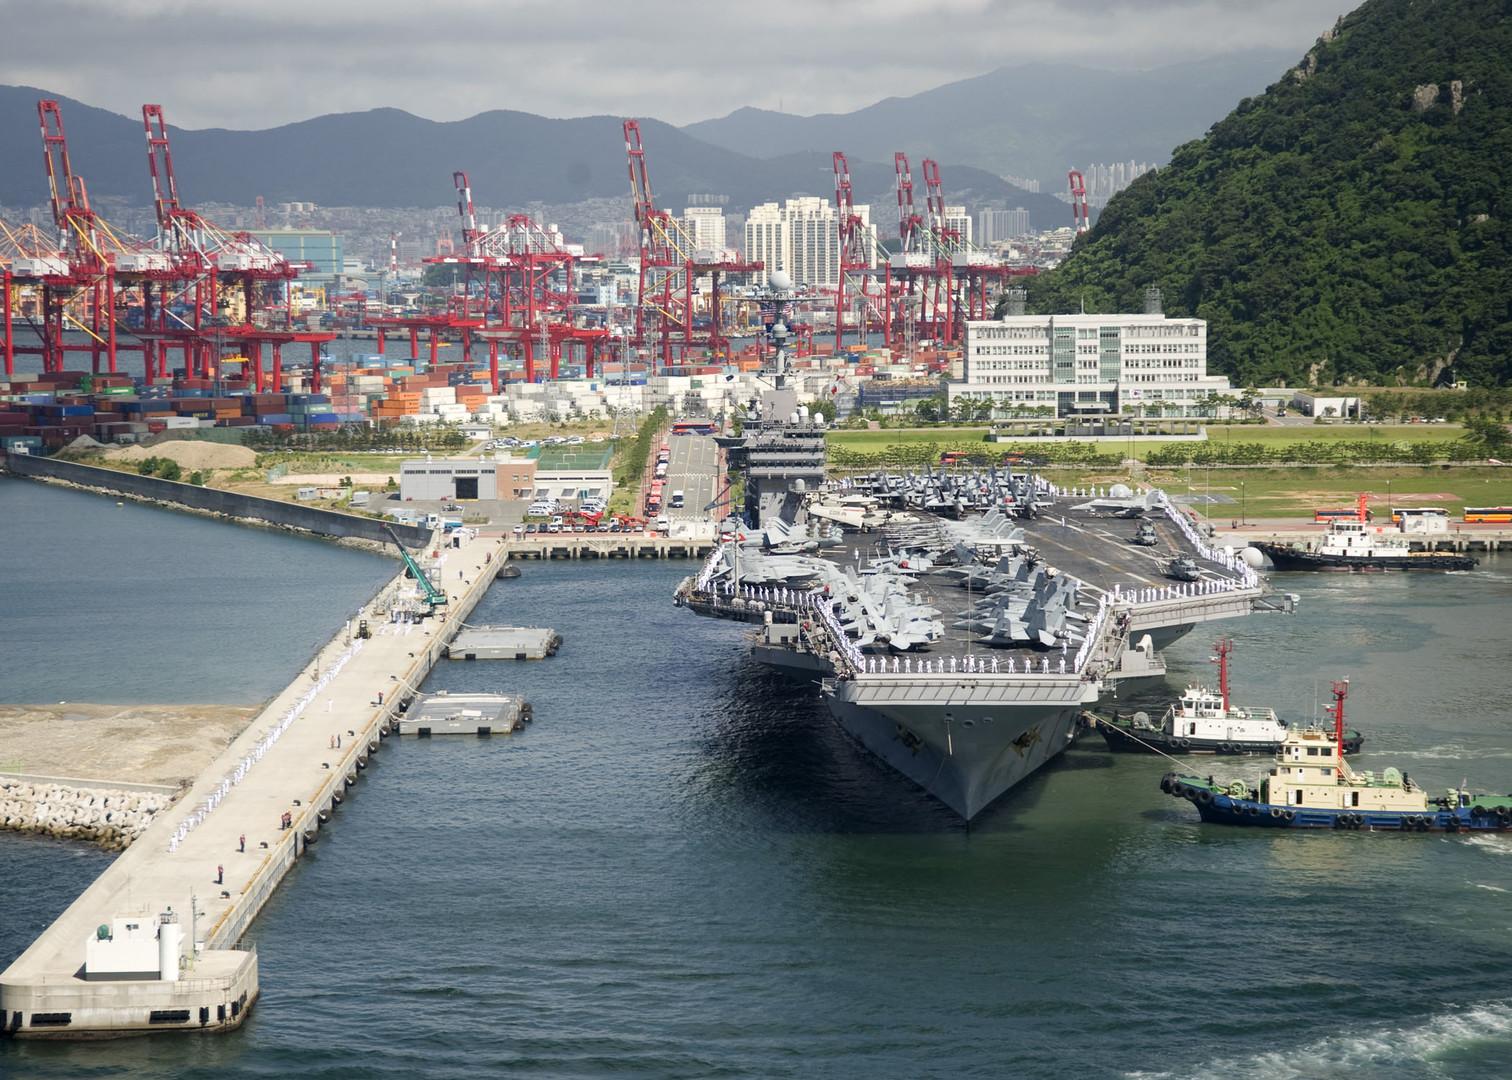 Der Flugzeuträger  USS George Washington auf der US-Militärbasis Osan, Südkorea.